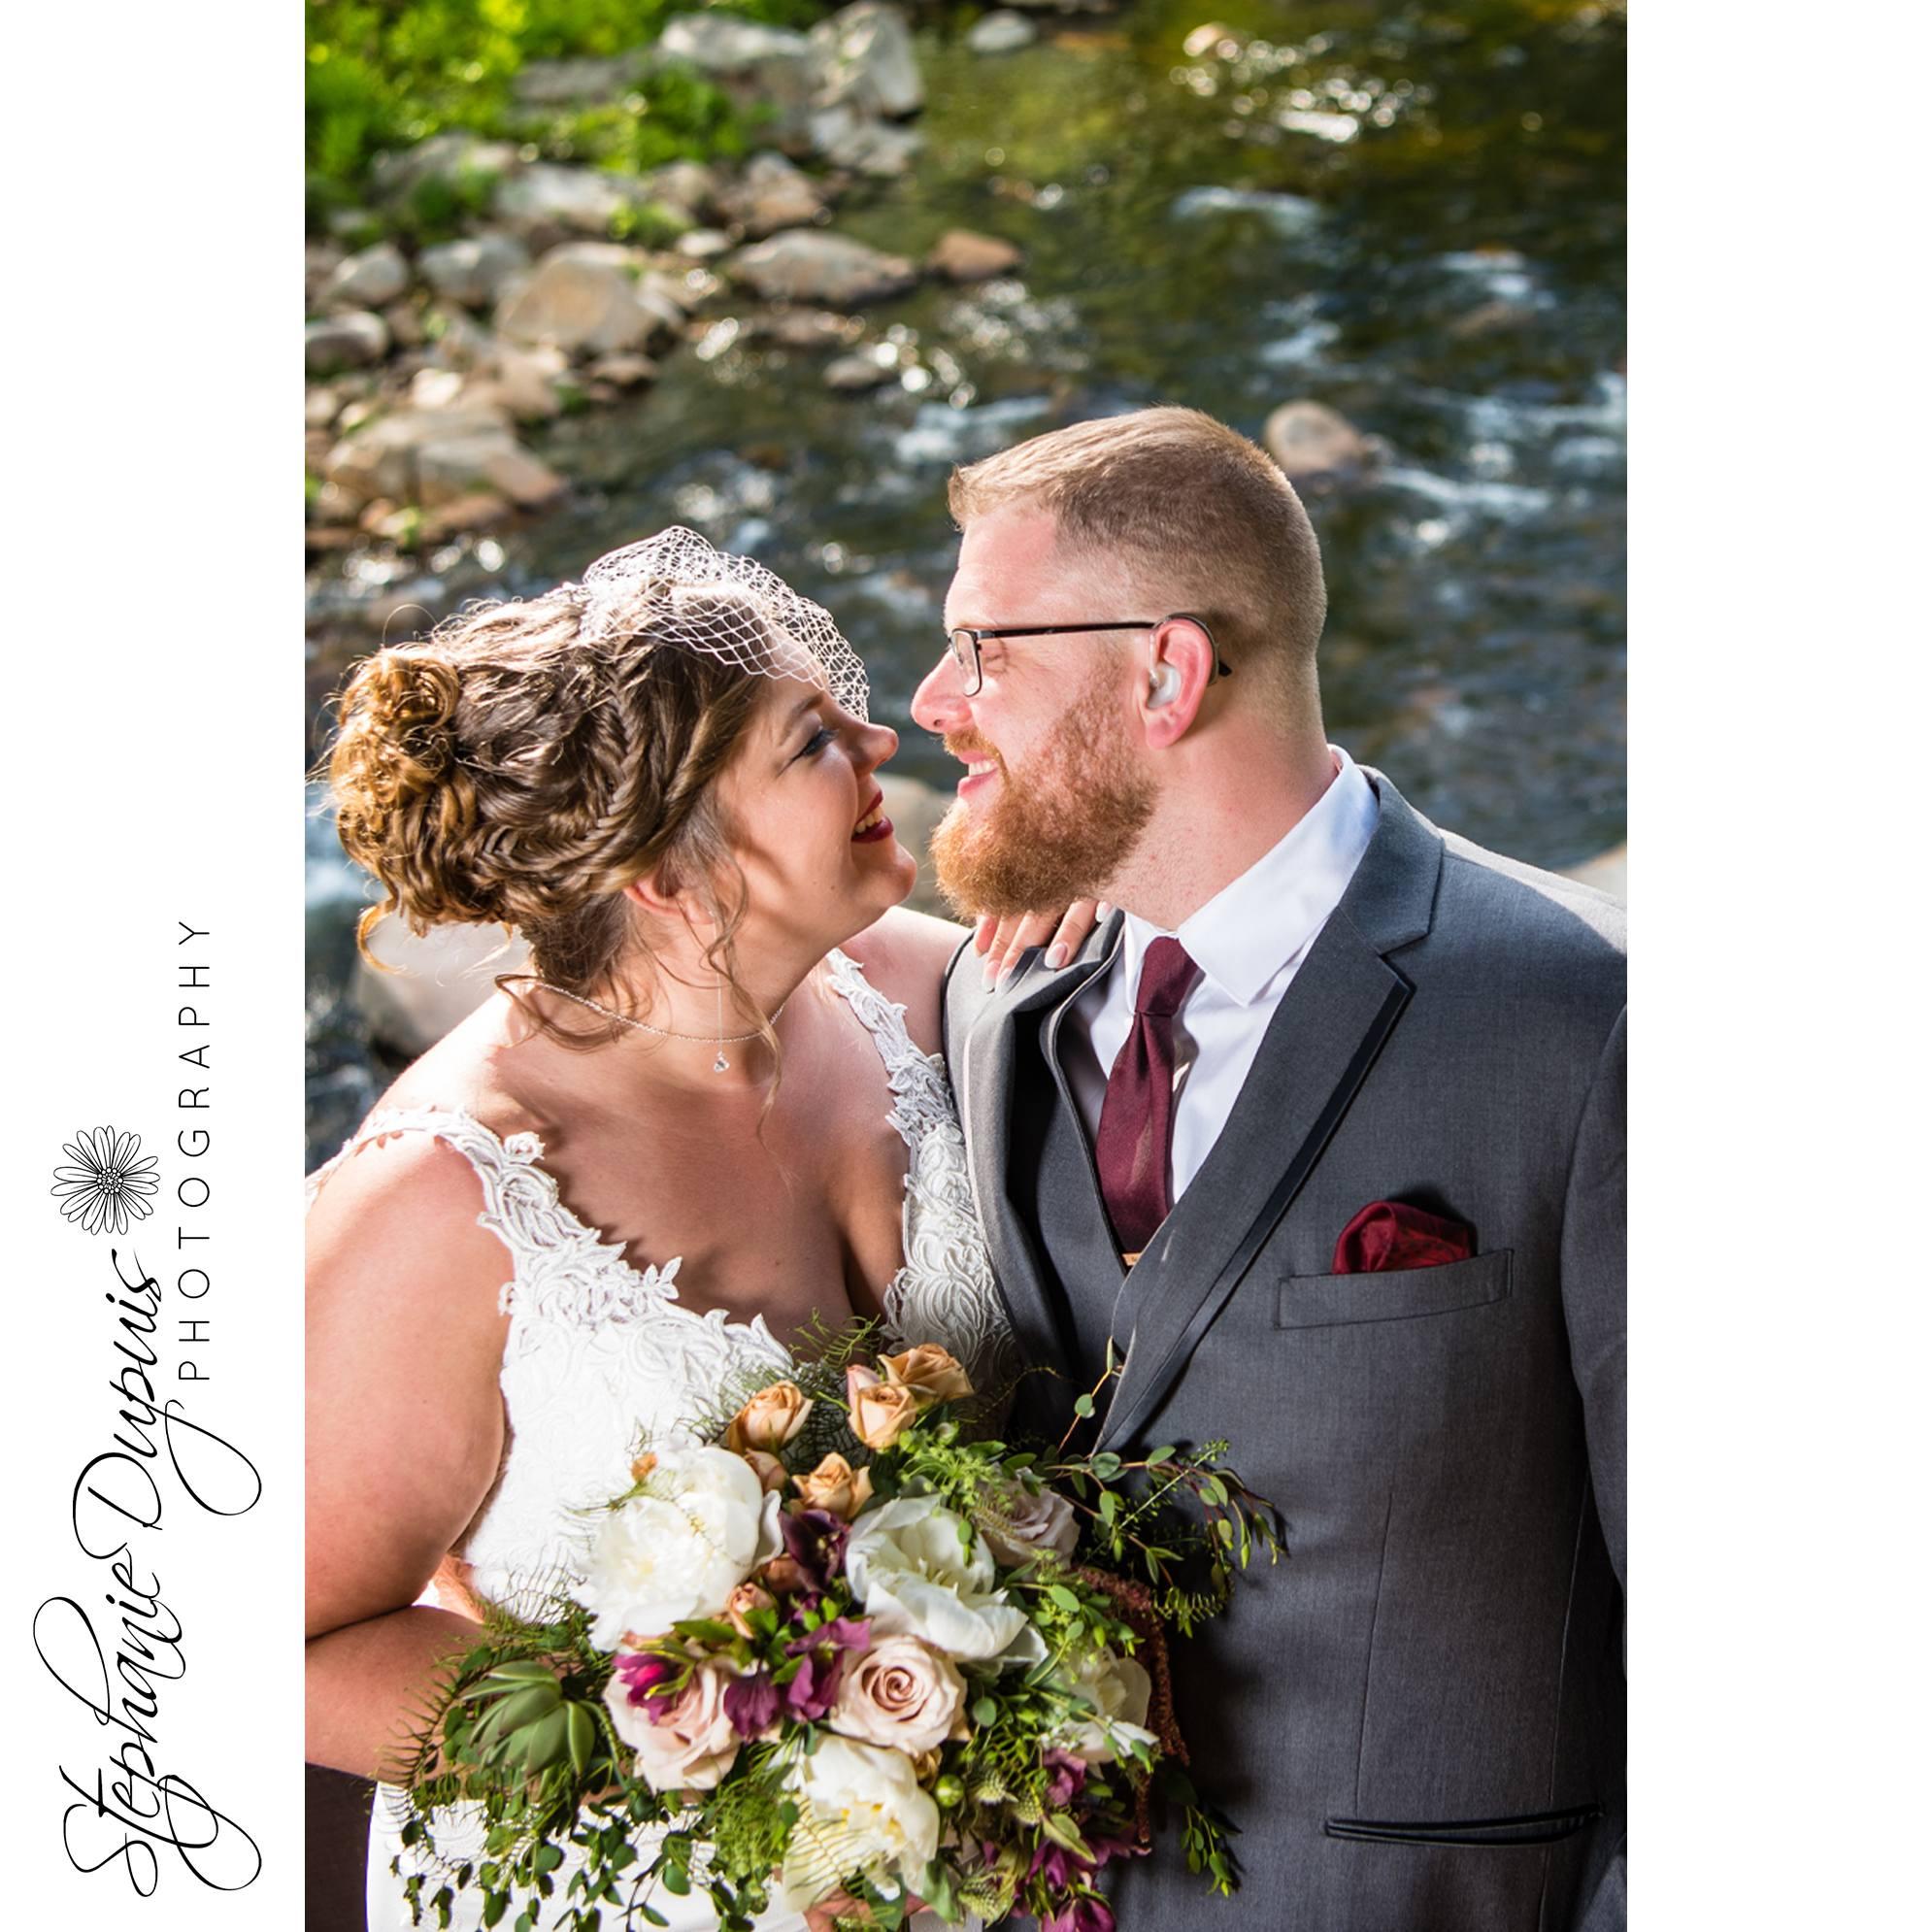 Pushee 15 - Portfolio: Pushee Wedding